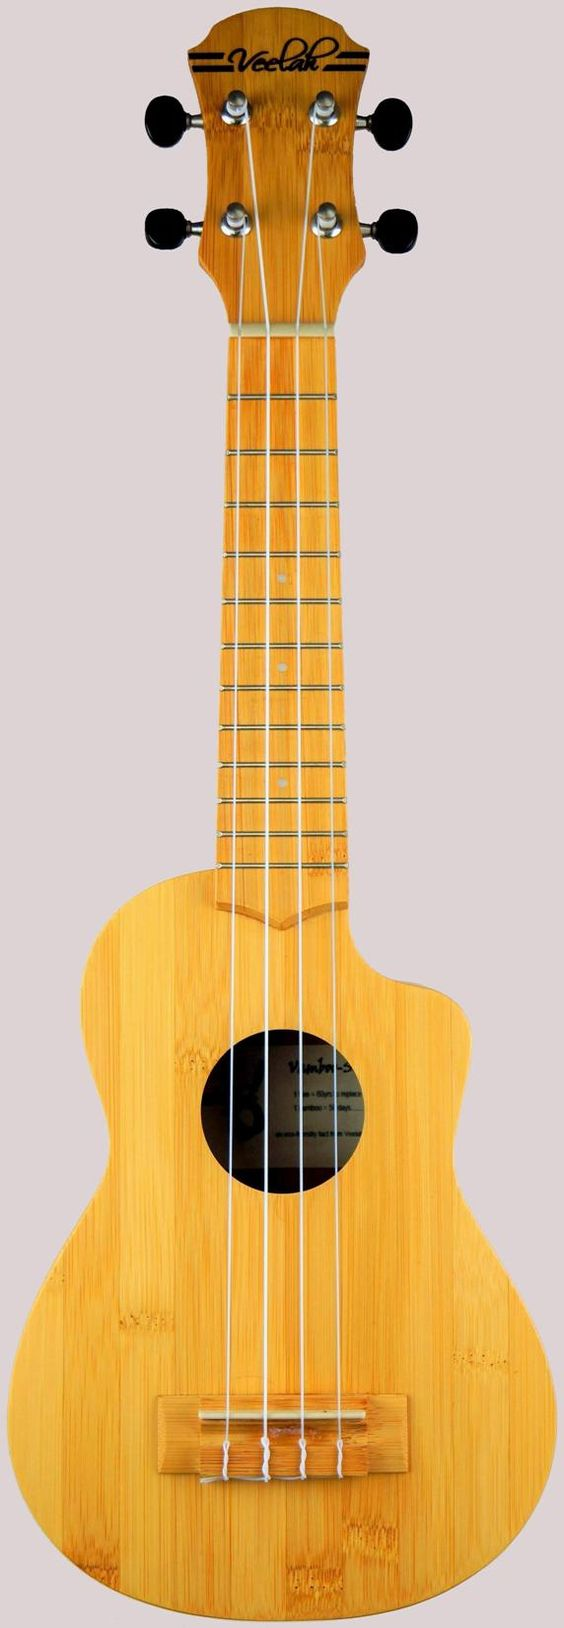 Veelah Vamboo Bamboo Acoustic Soprano